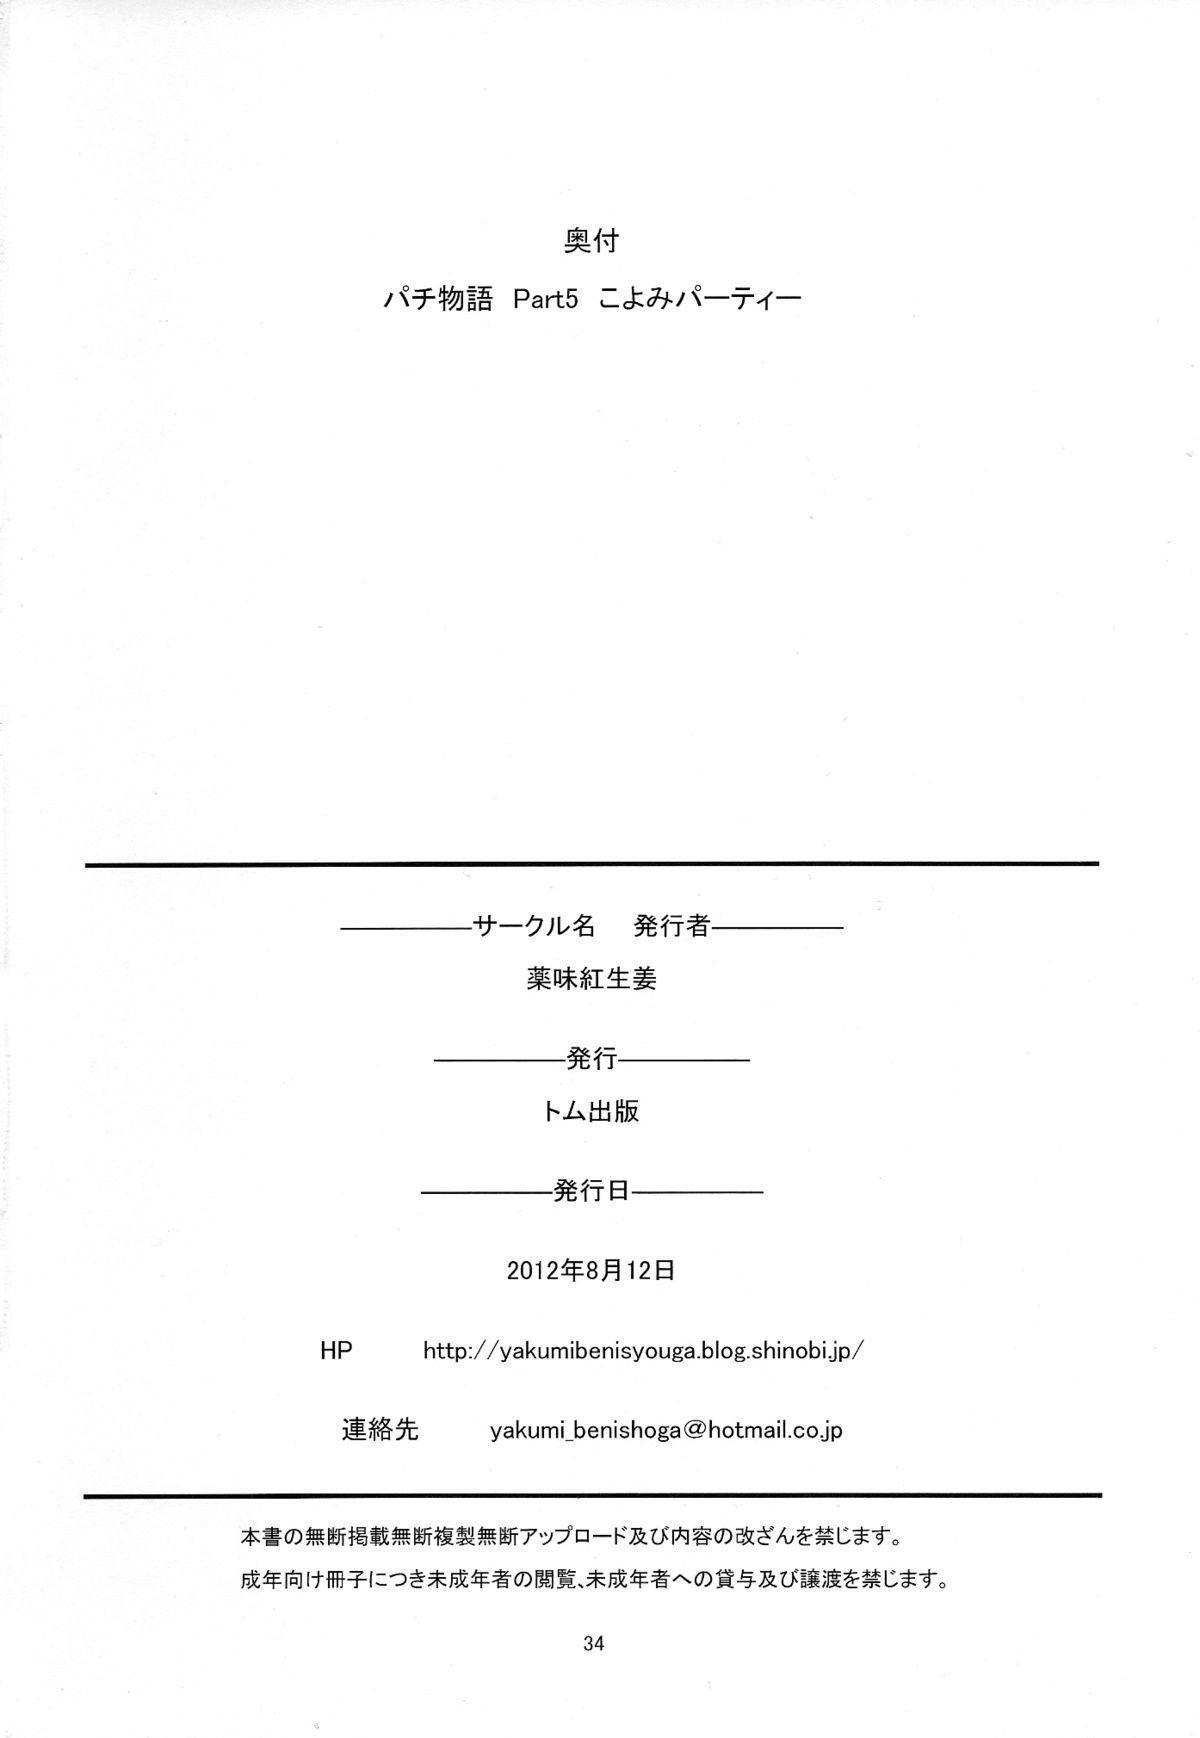 Pachimonogatari Part 5: Koyomi Party 33